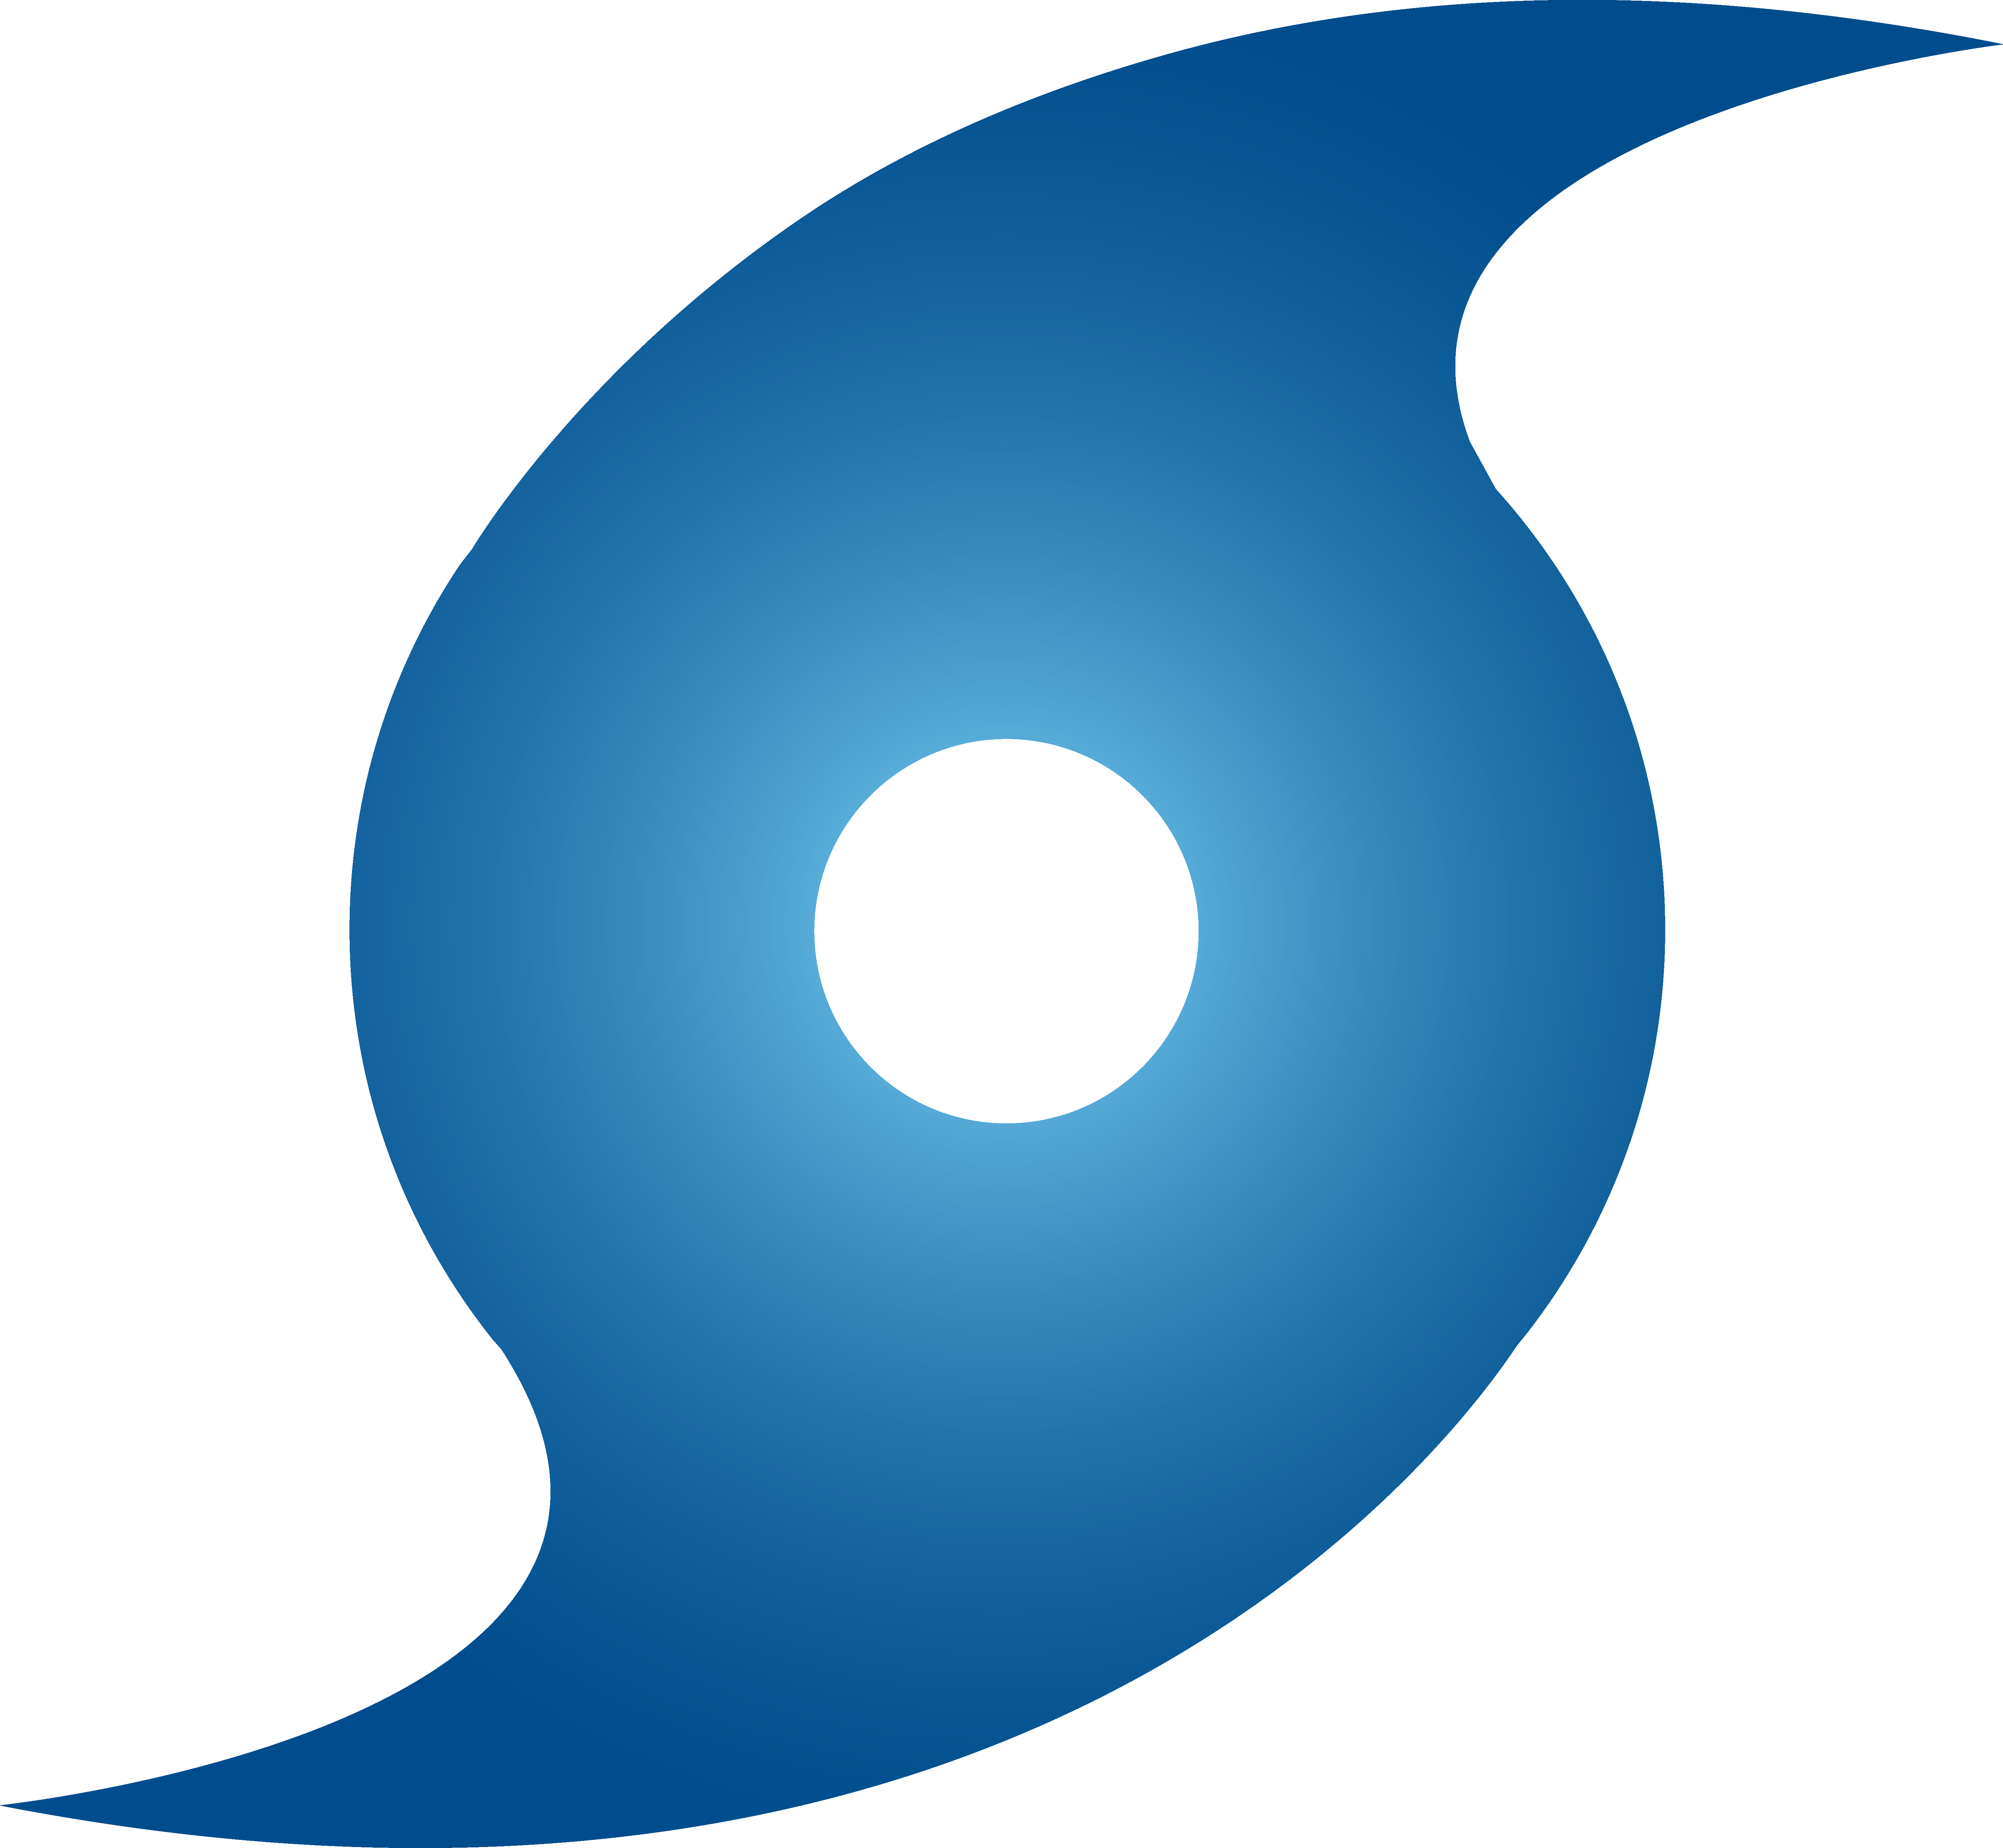 6197x5717 Blue Hurricane Weather Symbol